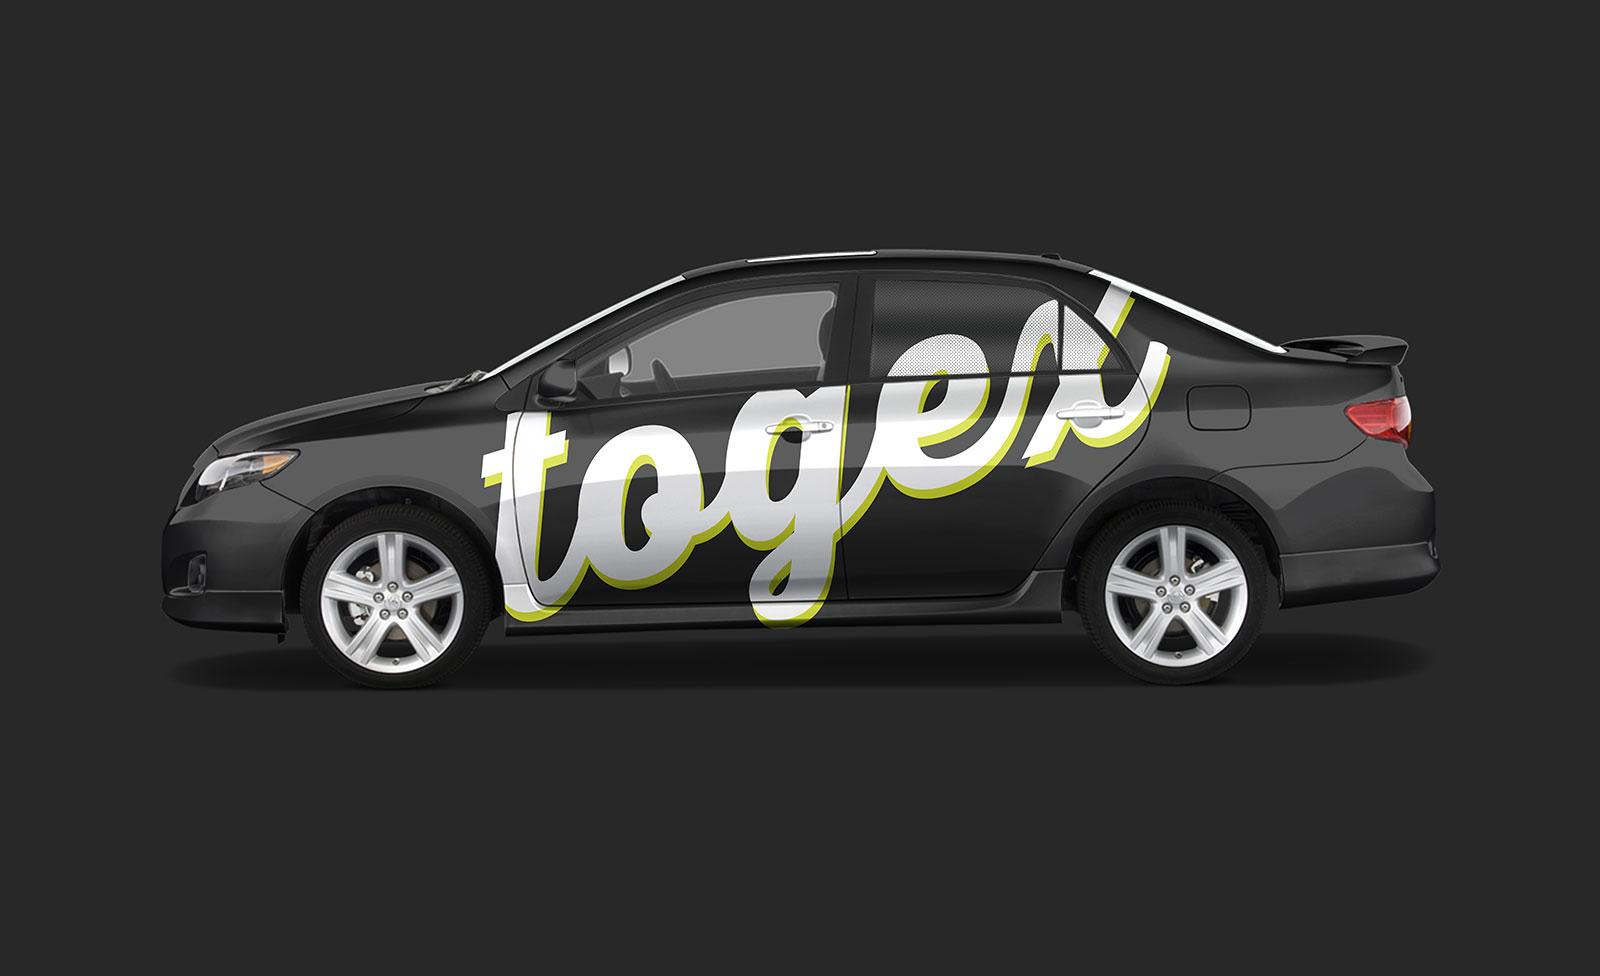 Free-Toyota-Corolla-Car-Branding-Mockup-PSD-5